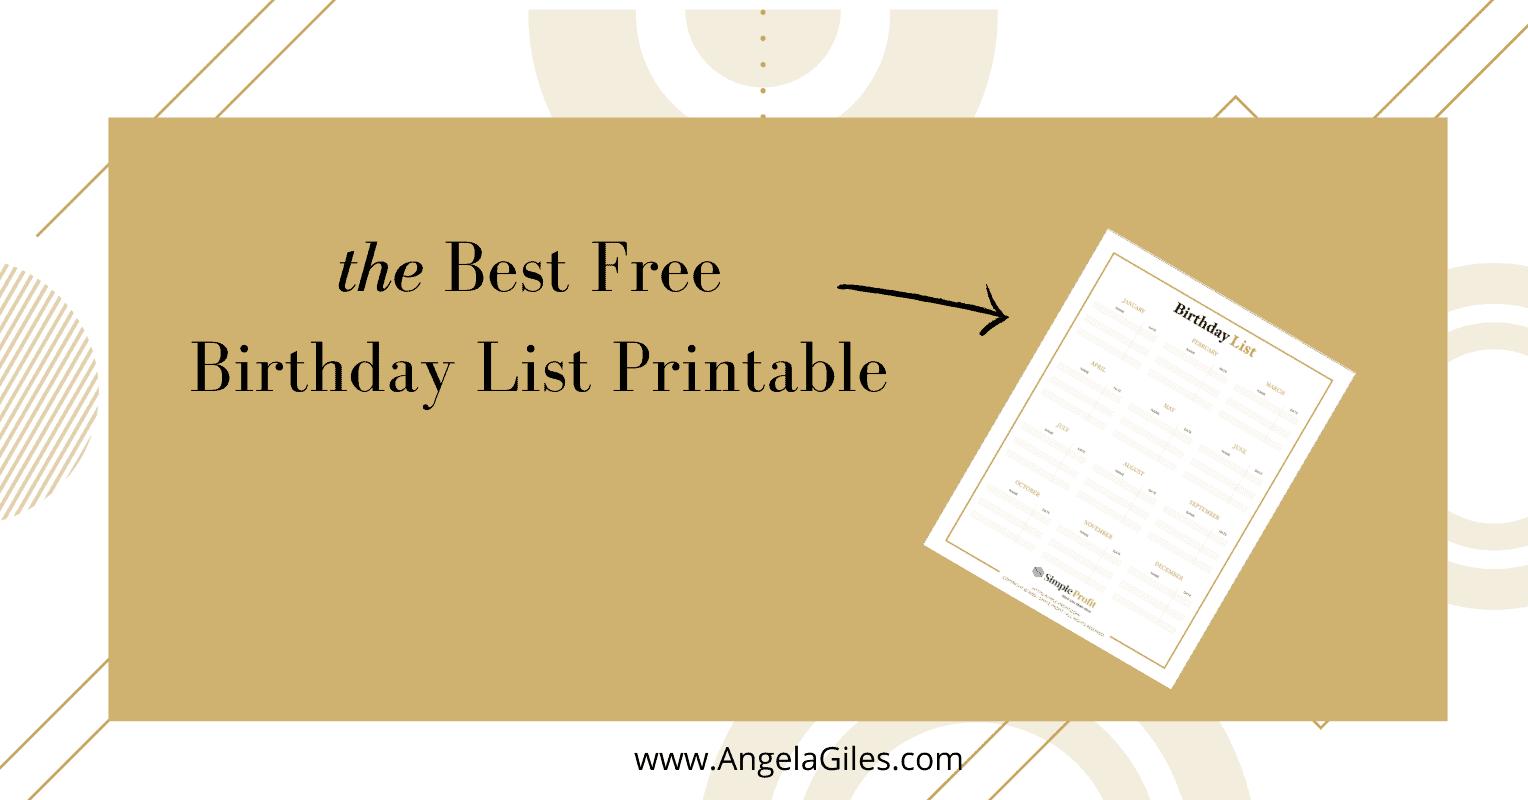 The Best Free Birthday List Printable